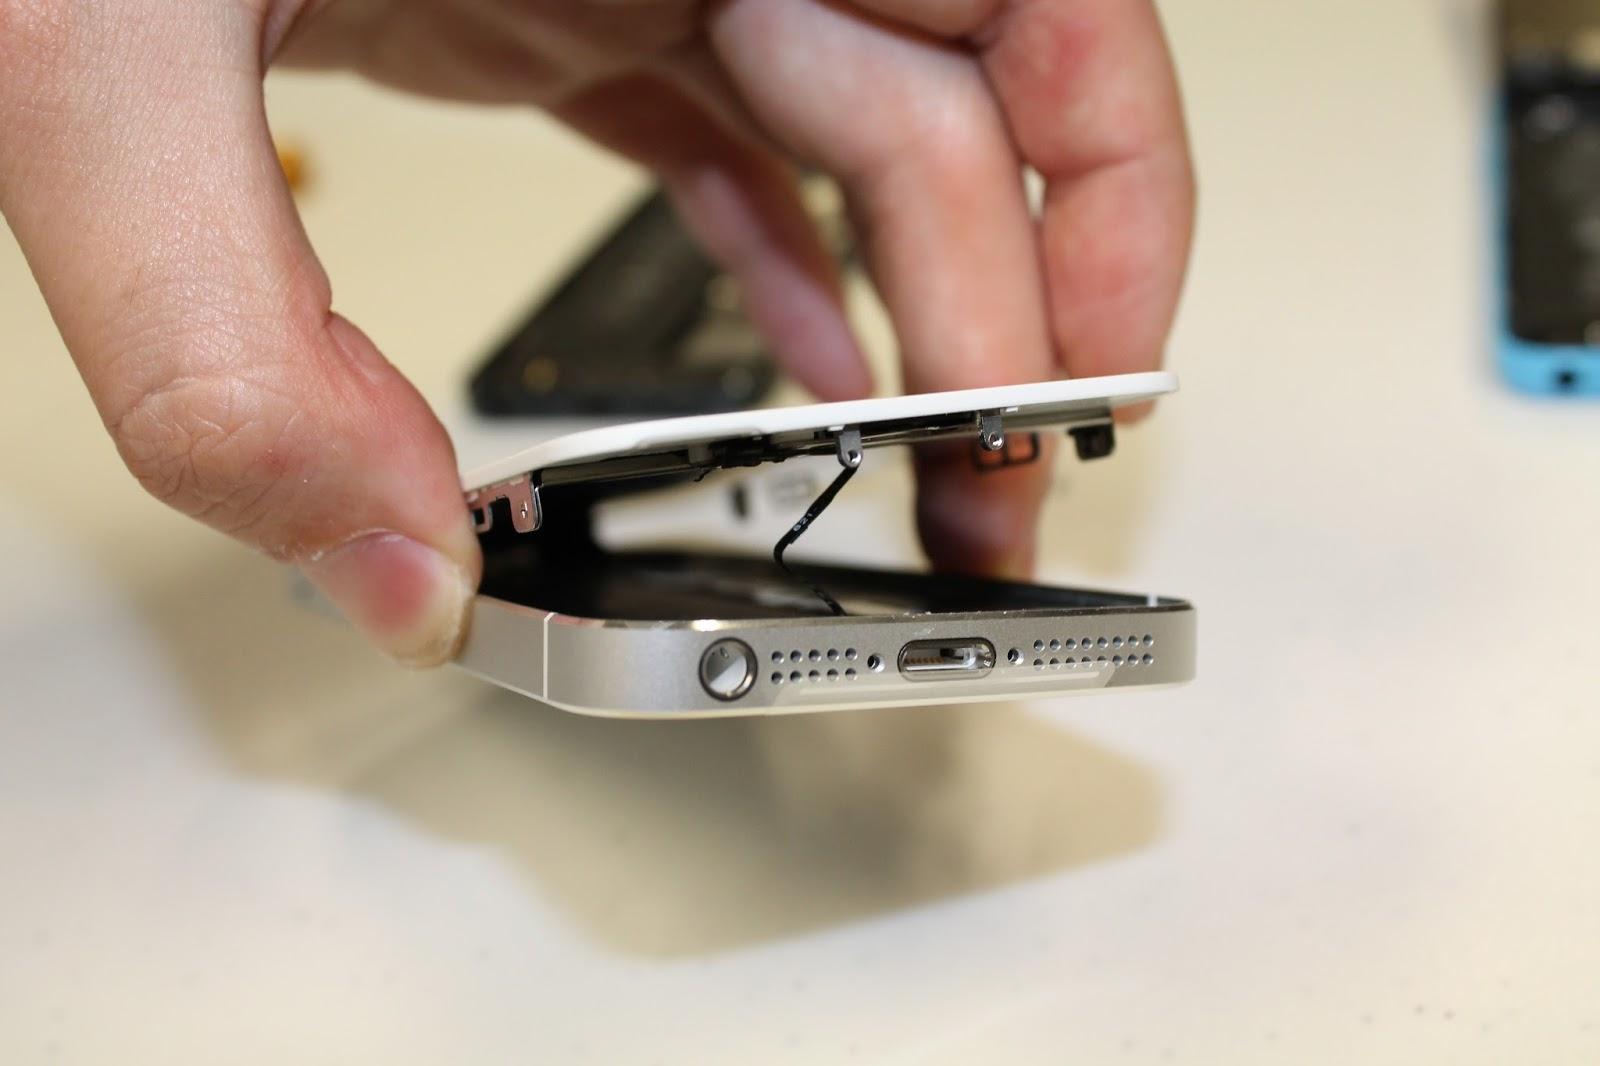 iphone-5s-i-iphone-5c-razobrali-na-chasti------------